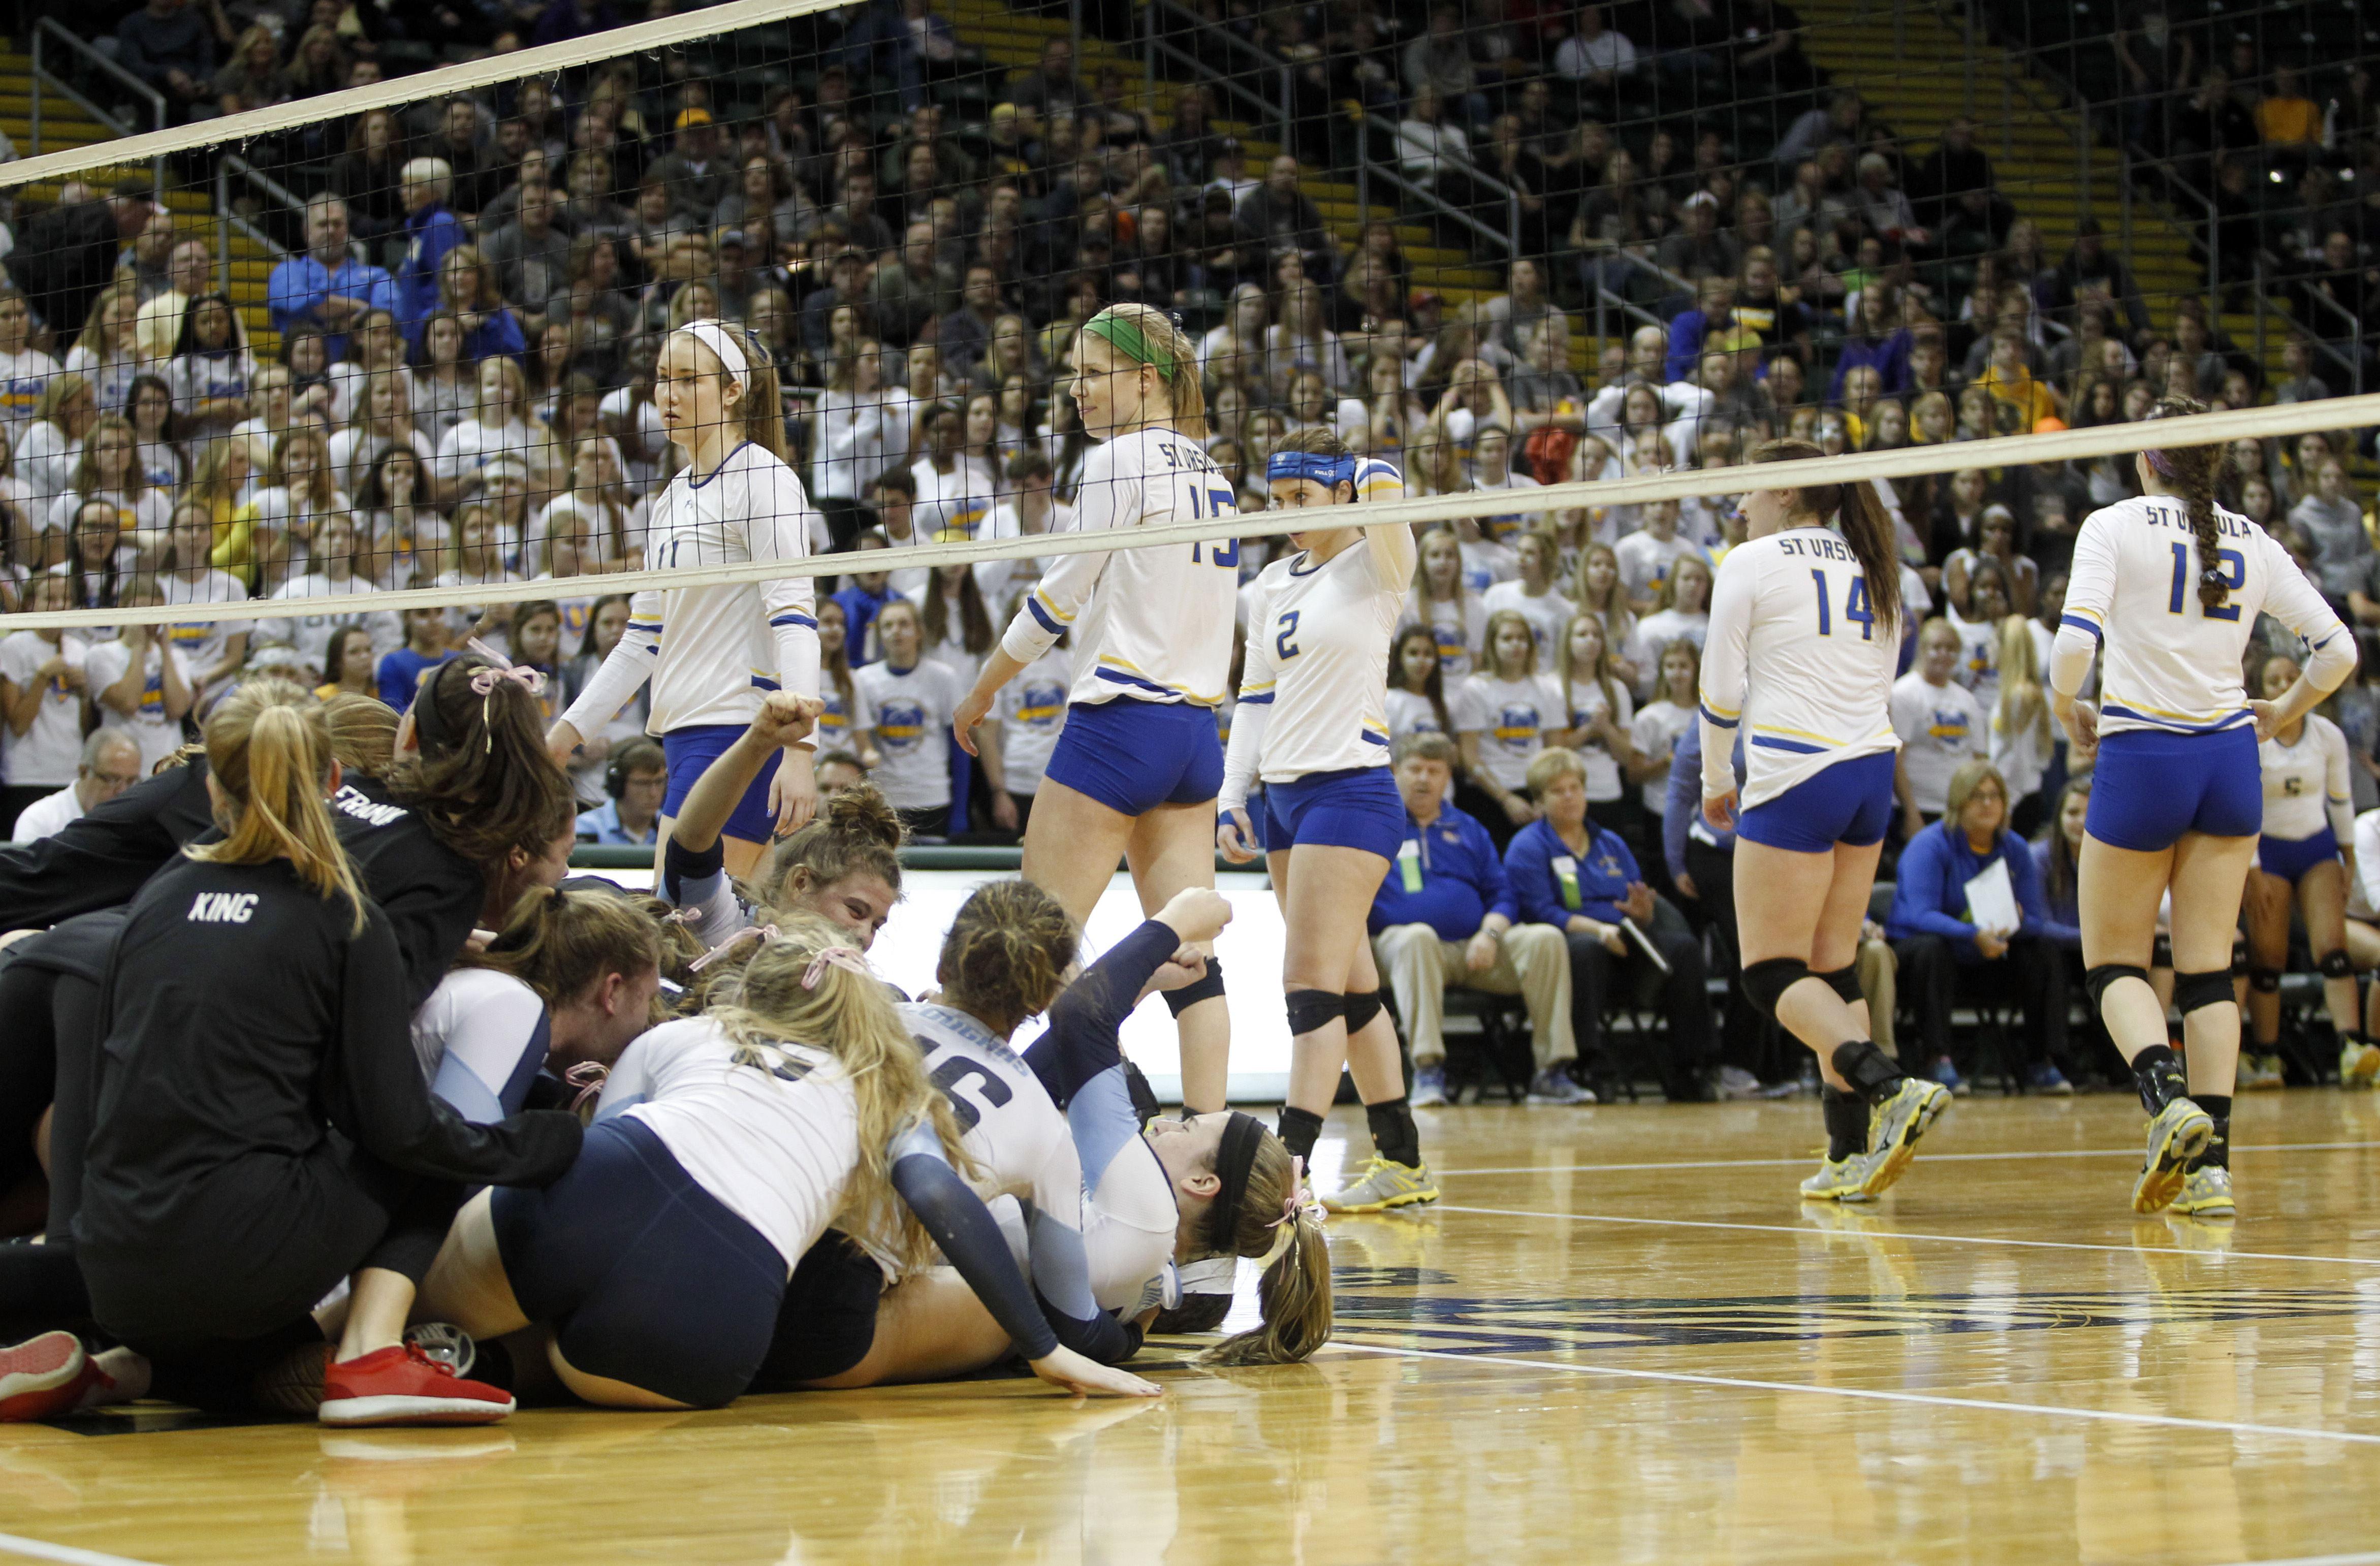 Catch It Kansas Volleyball Cffe F D Ccf Daebcb